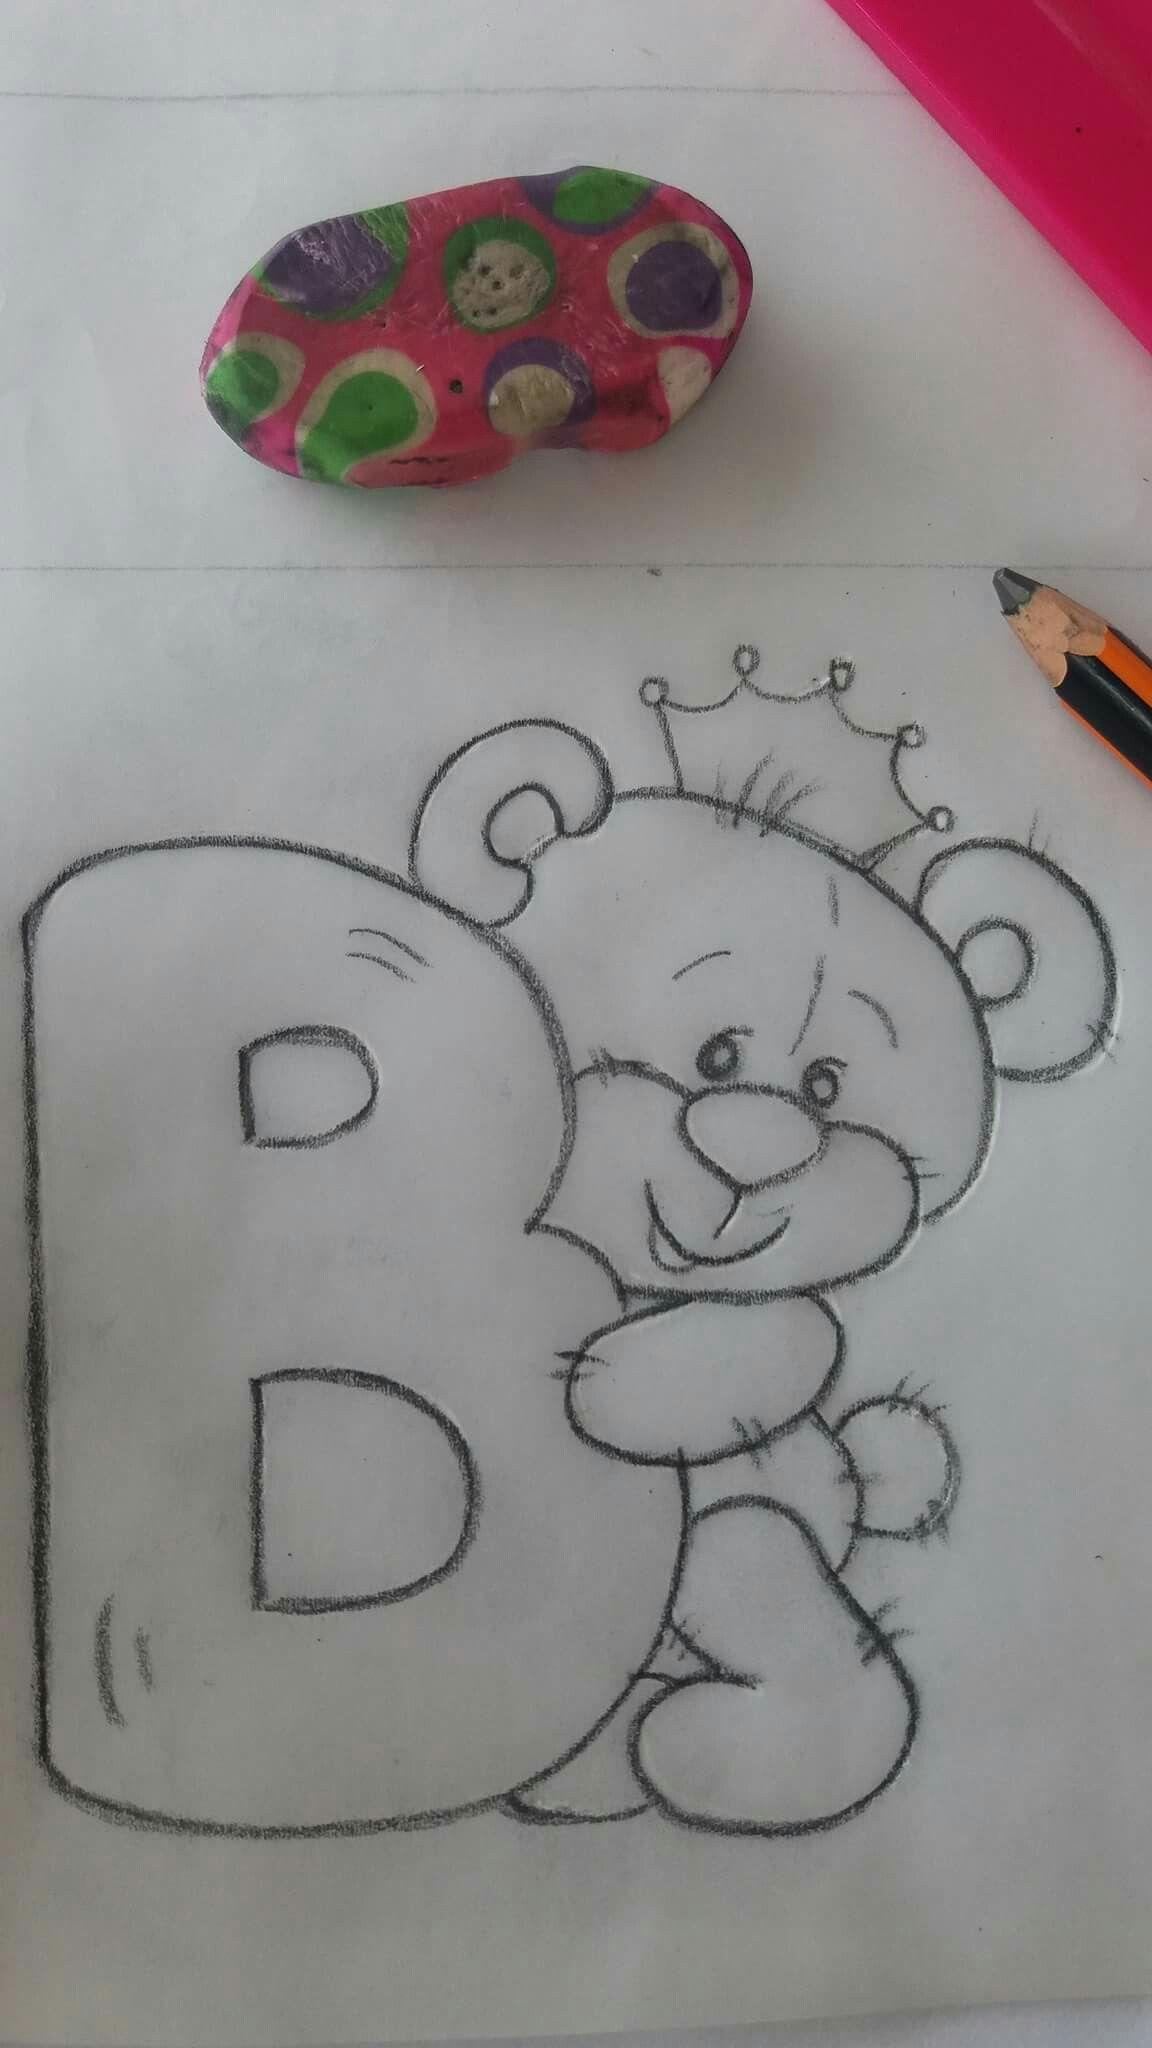 Literka B Z Misiem Desenhos Bonitos Coisas Simples Para